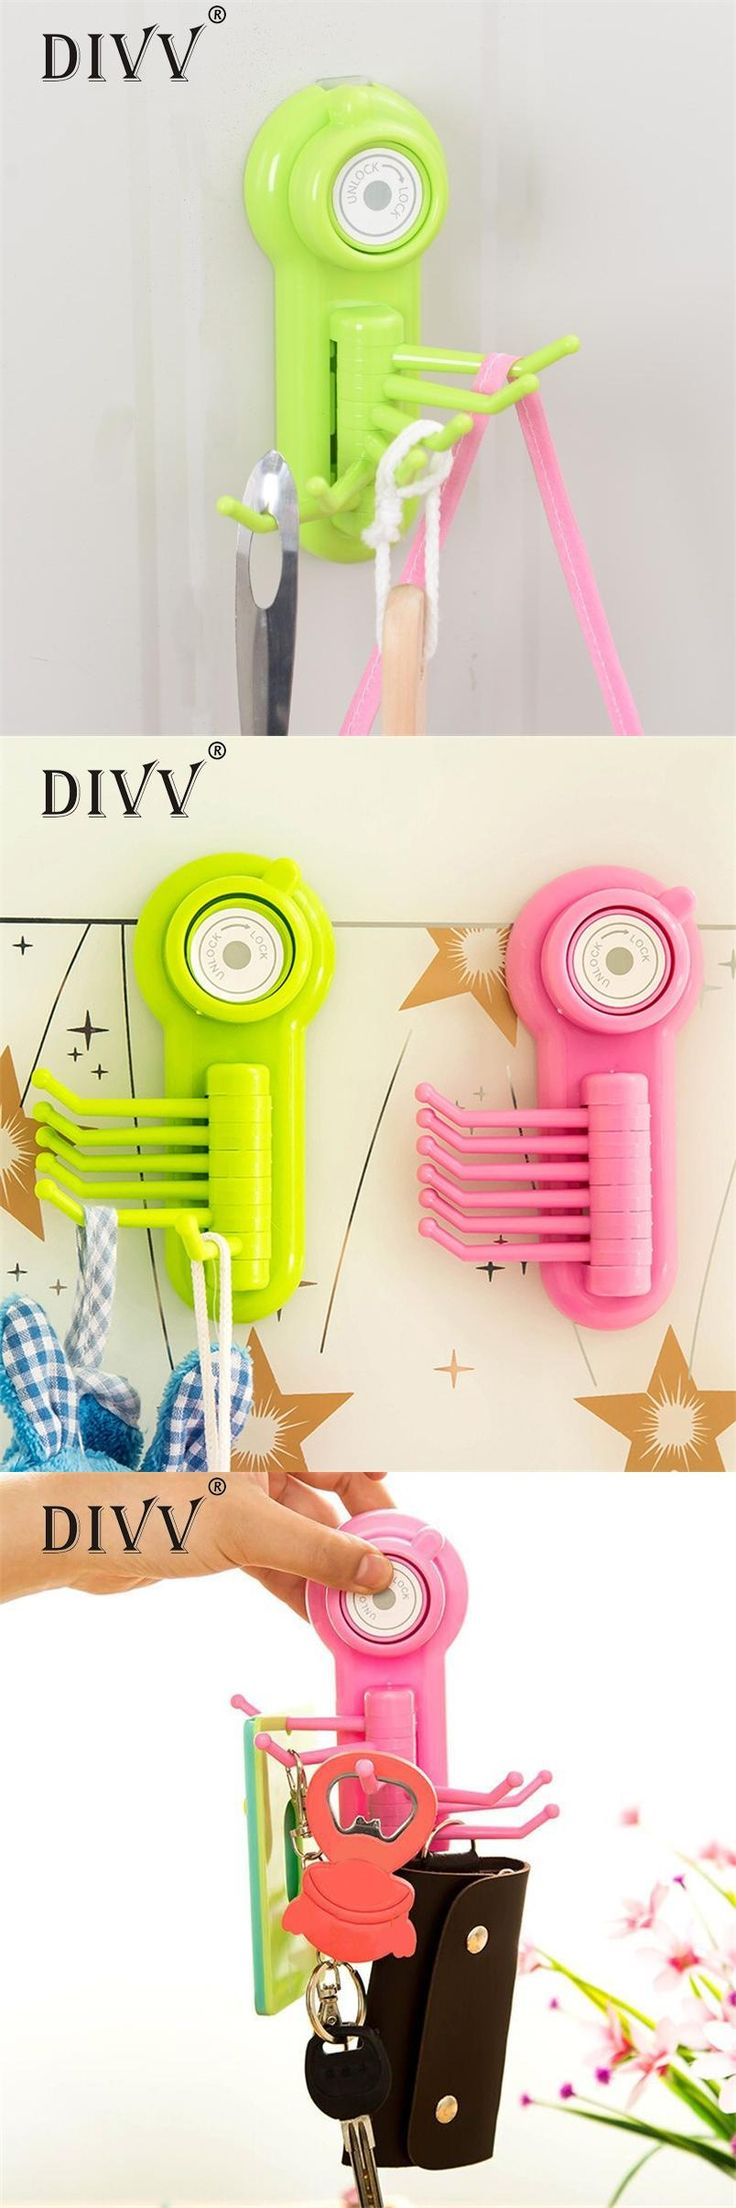 [Visit to Buy] DIVV crochet adhesif Multifunction Vacuum Sucker 6 Claw Hook Reusable Plastic Hooks Storage Tools*25 GIFT 2017 Drop #Advertisement